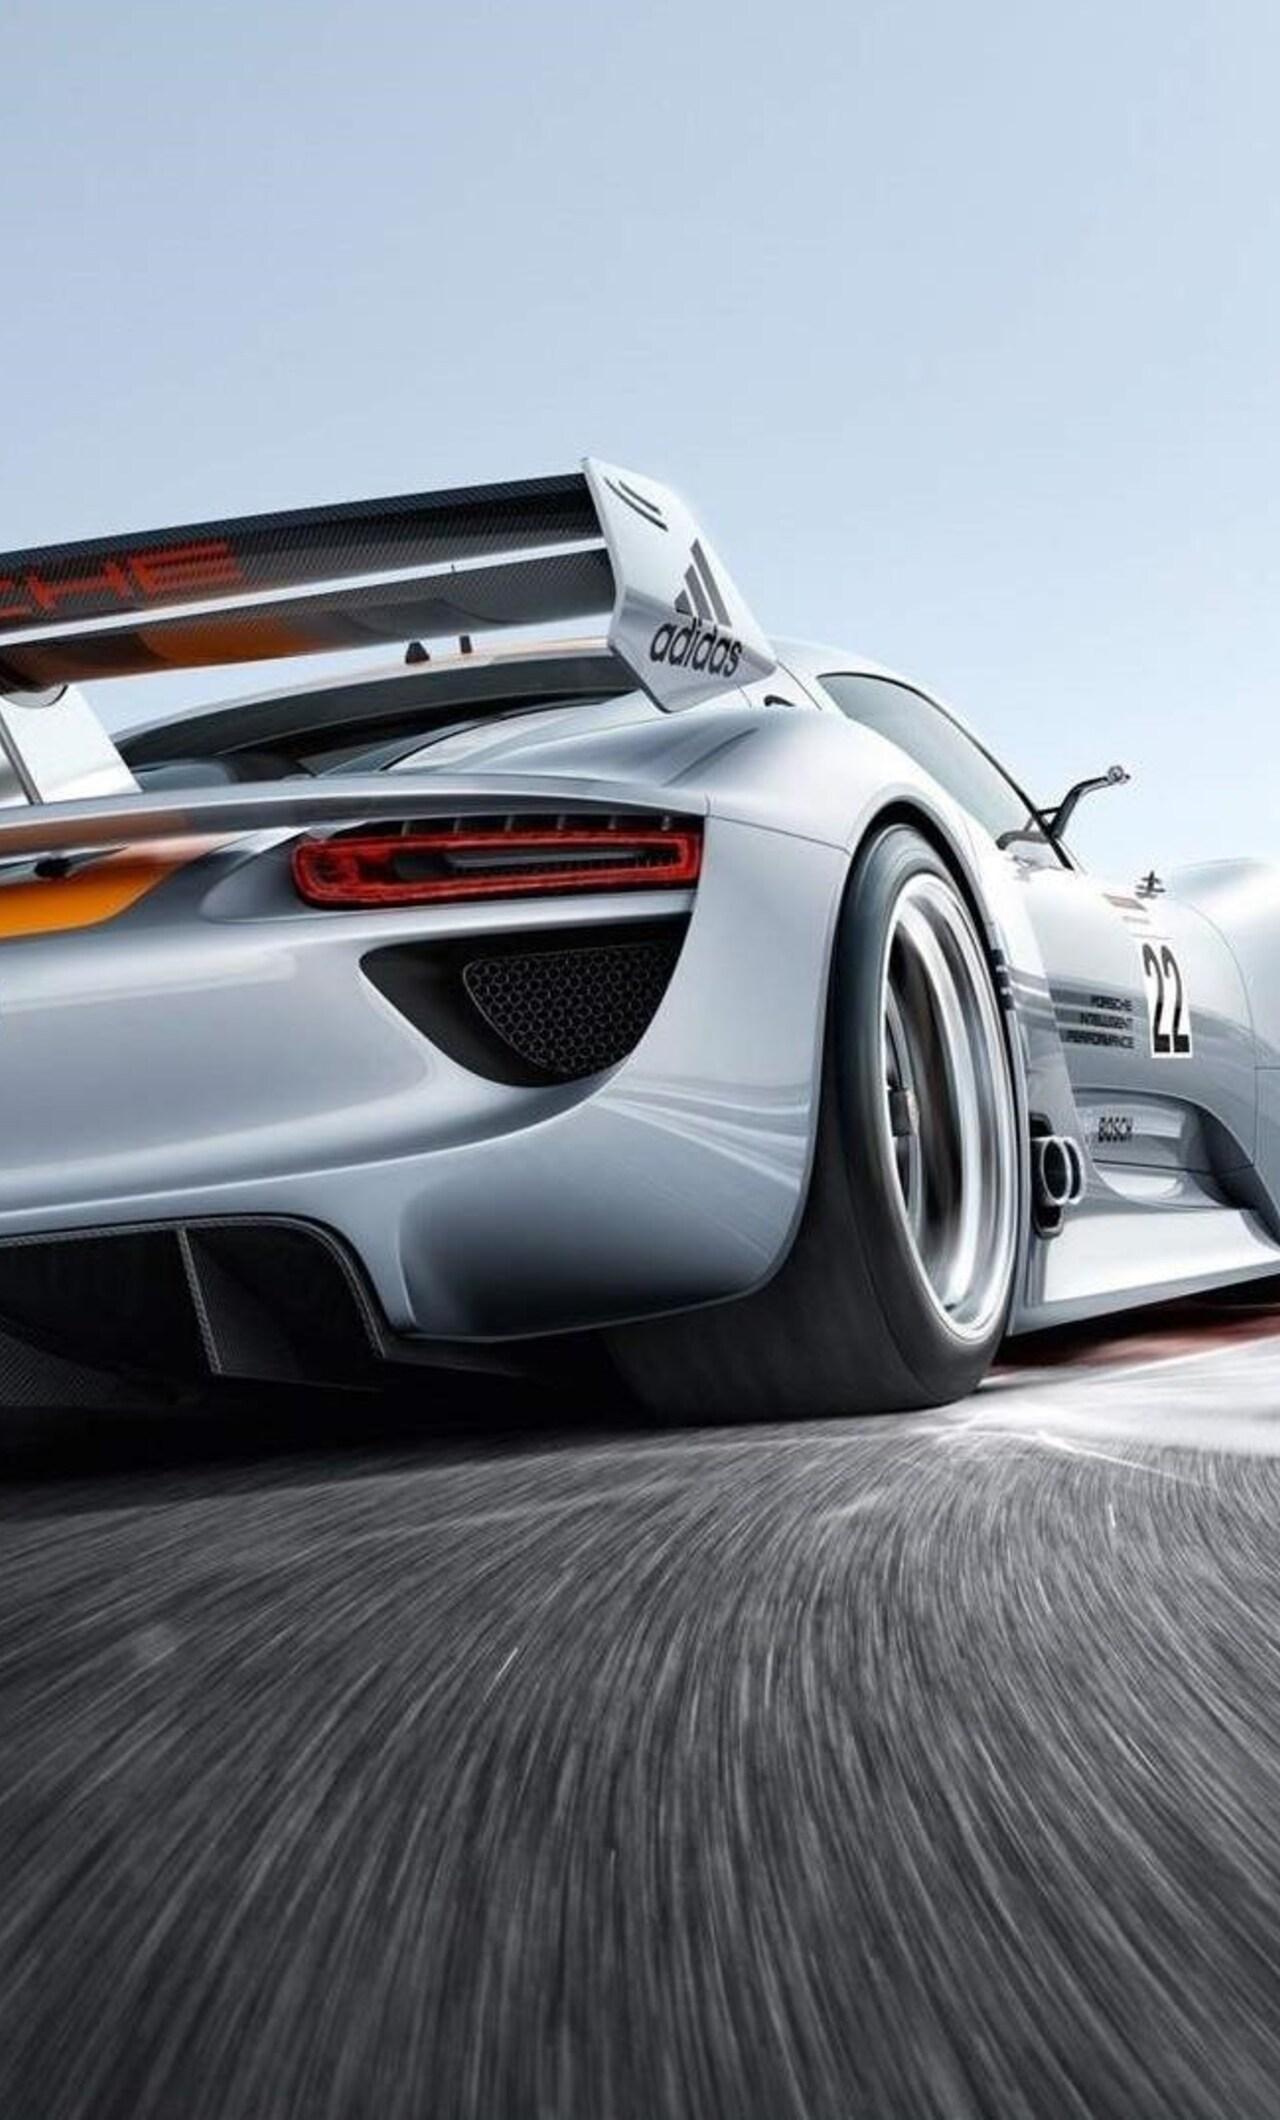 1280x2120 Porsche Spyder 918 Iphone 6 Hd 4k Wallpapers Images